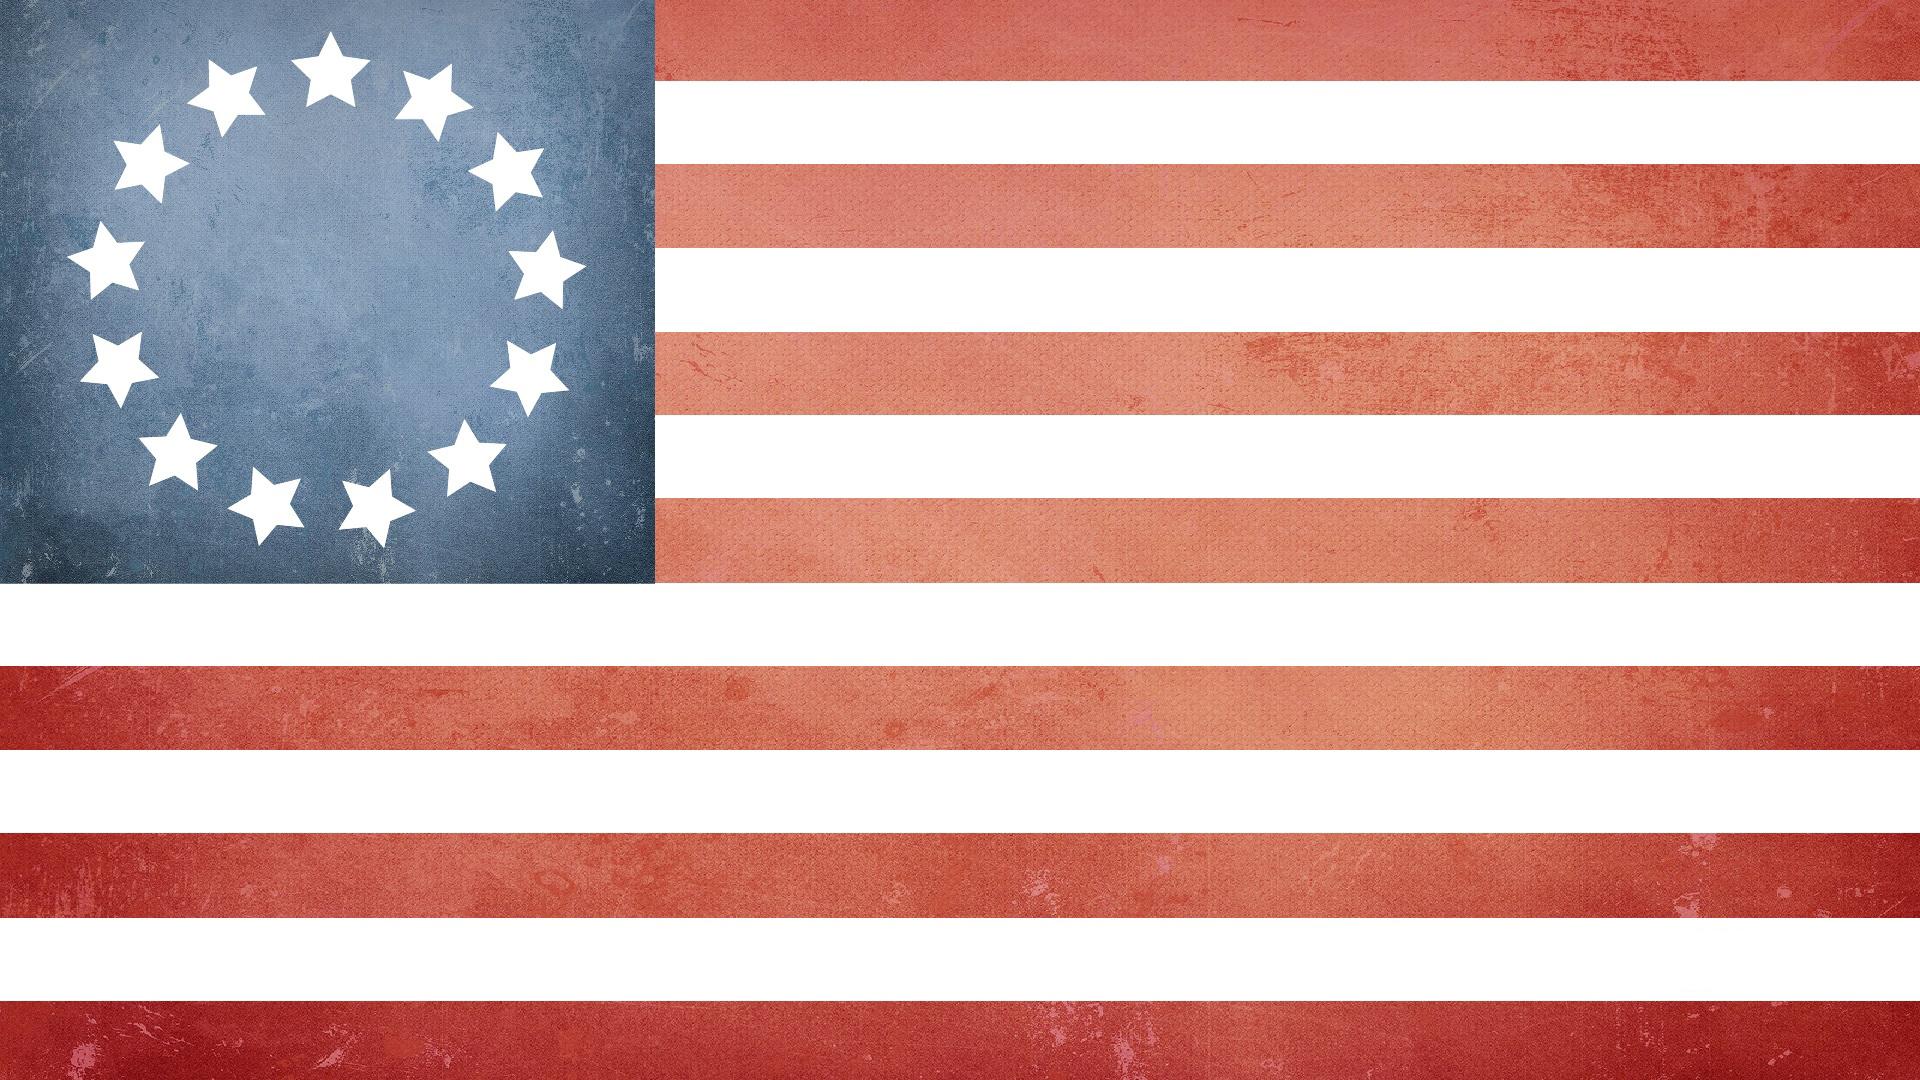 American Flag HD Desktop Wallpapers Live HD Wallpaper HQ Pictures 1920x1080